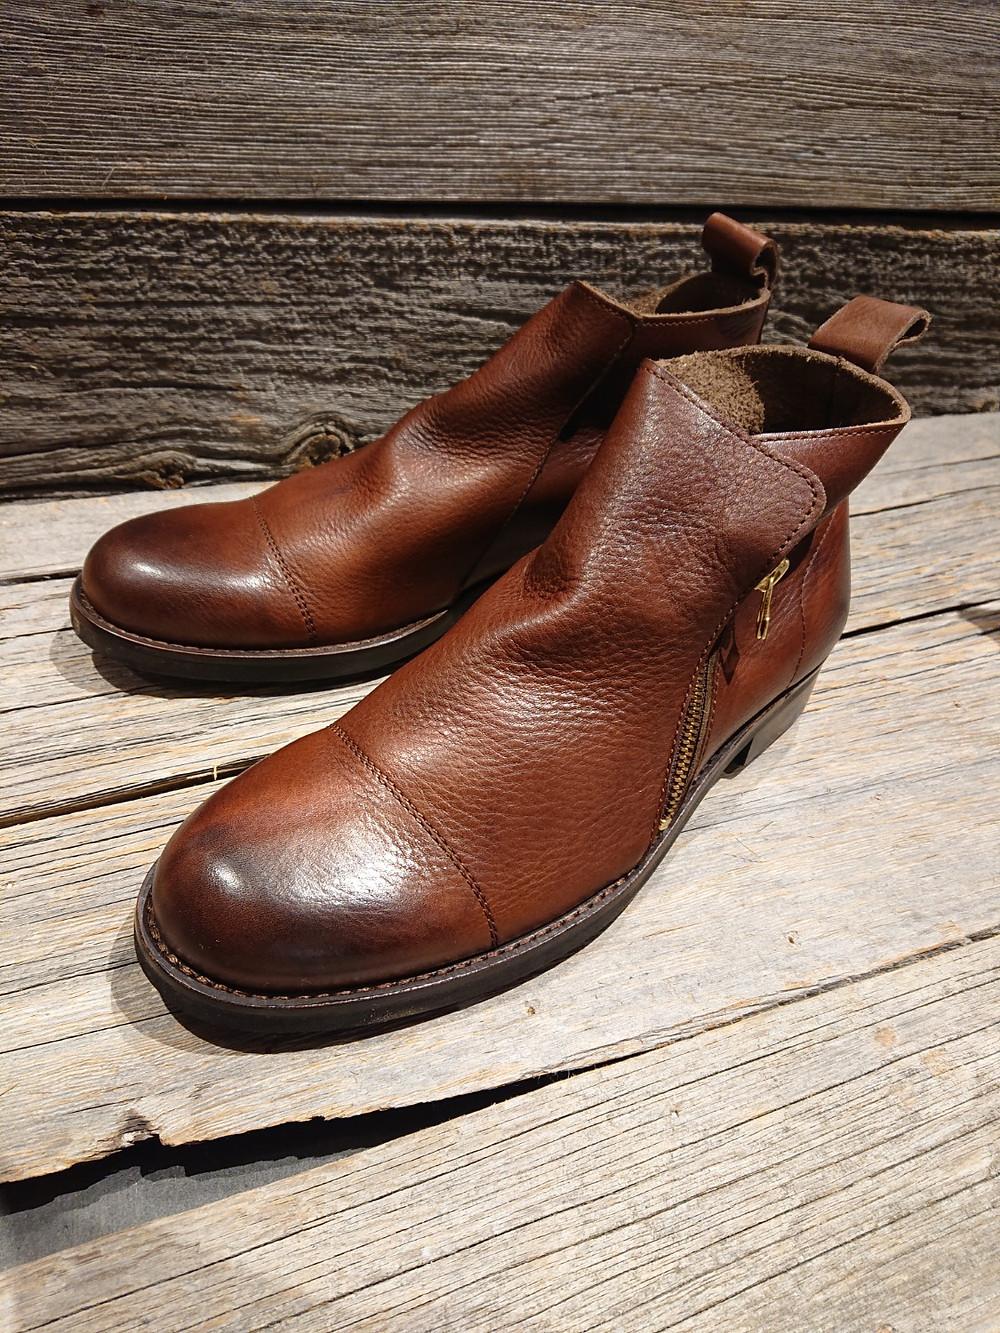 Master Craft Boots ブーツ 福岡